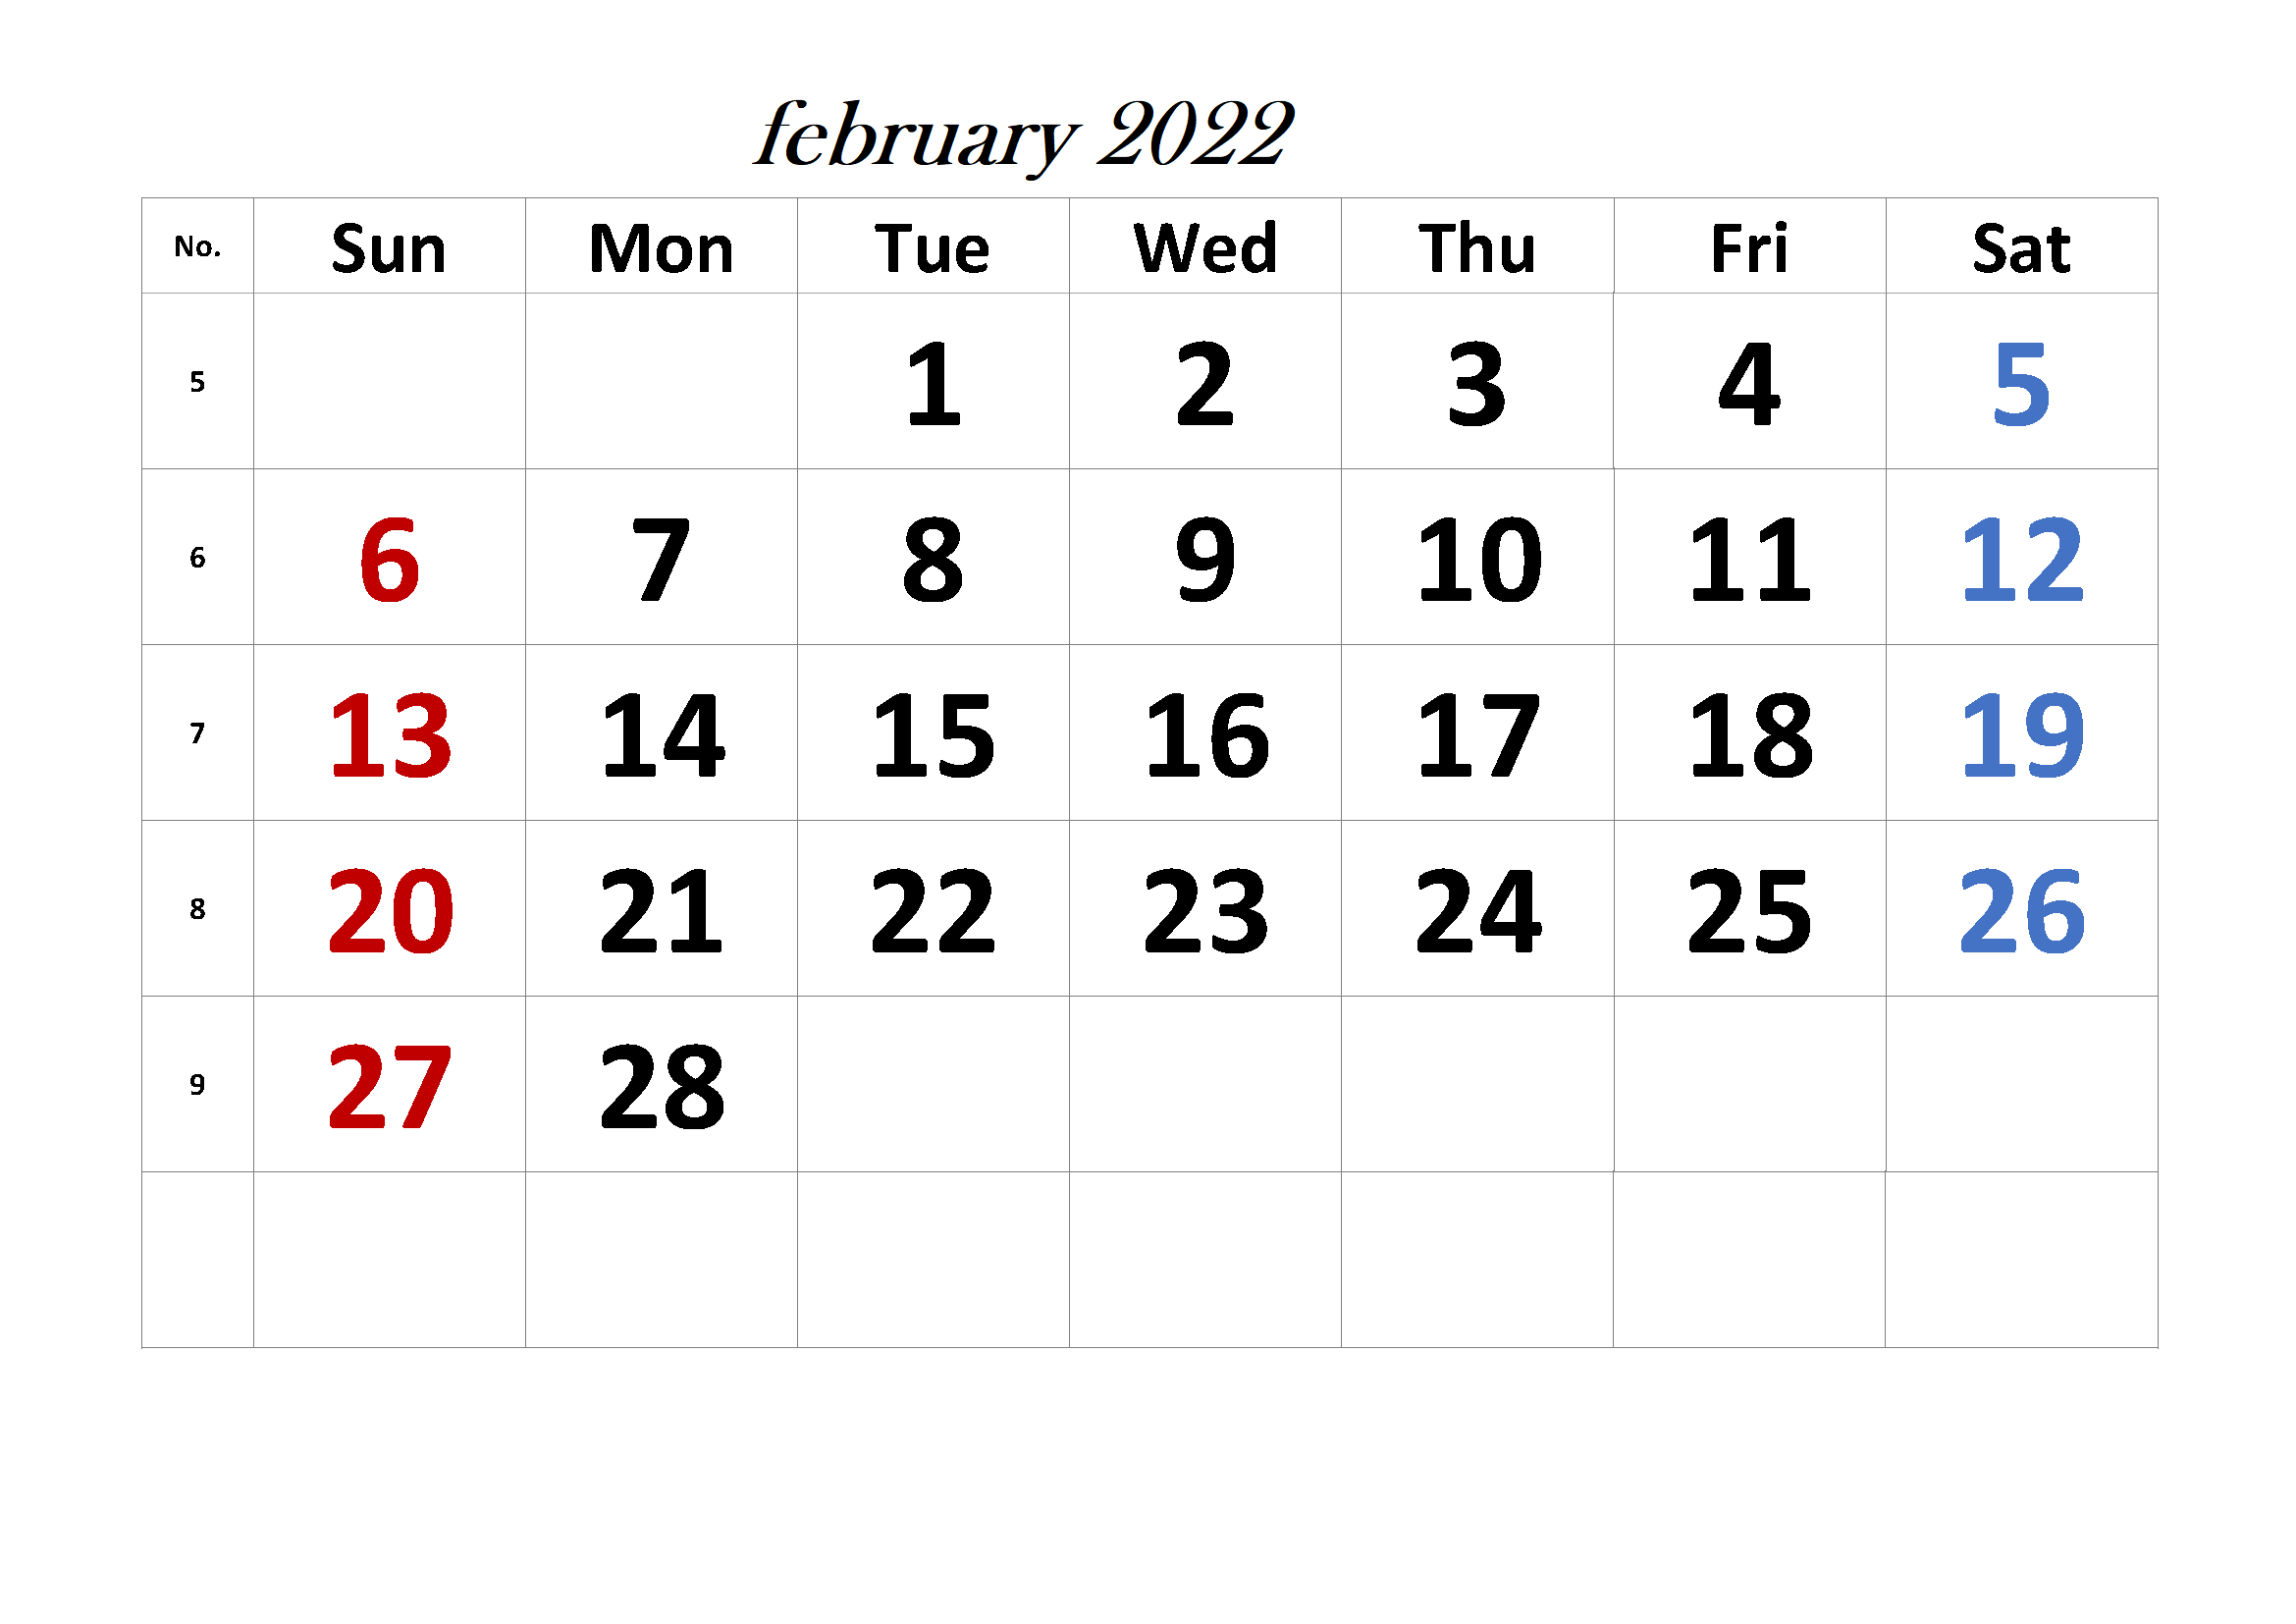 february-2022-calendar-printable-week